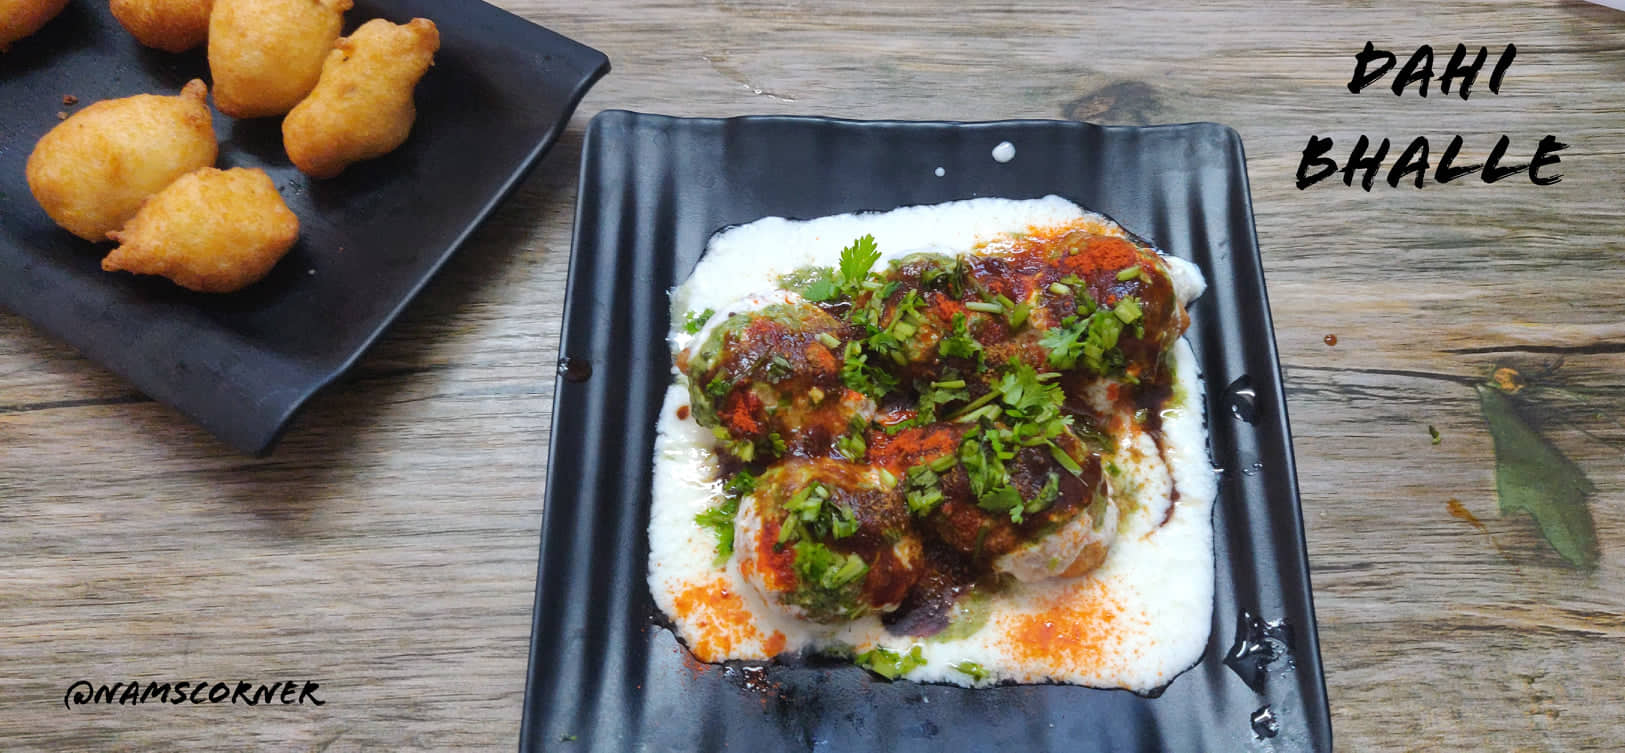 Dahi Bhalle Recipe | Dahi Bhalla Recipe | How to make Dahi Bhalle